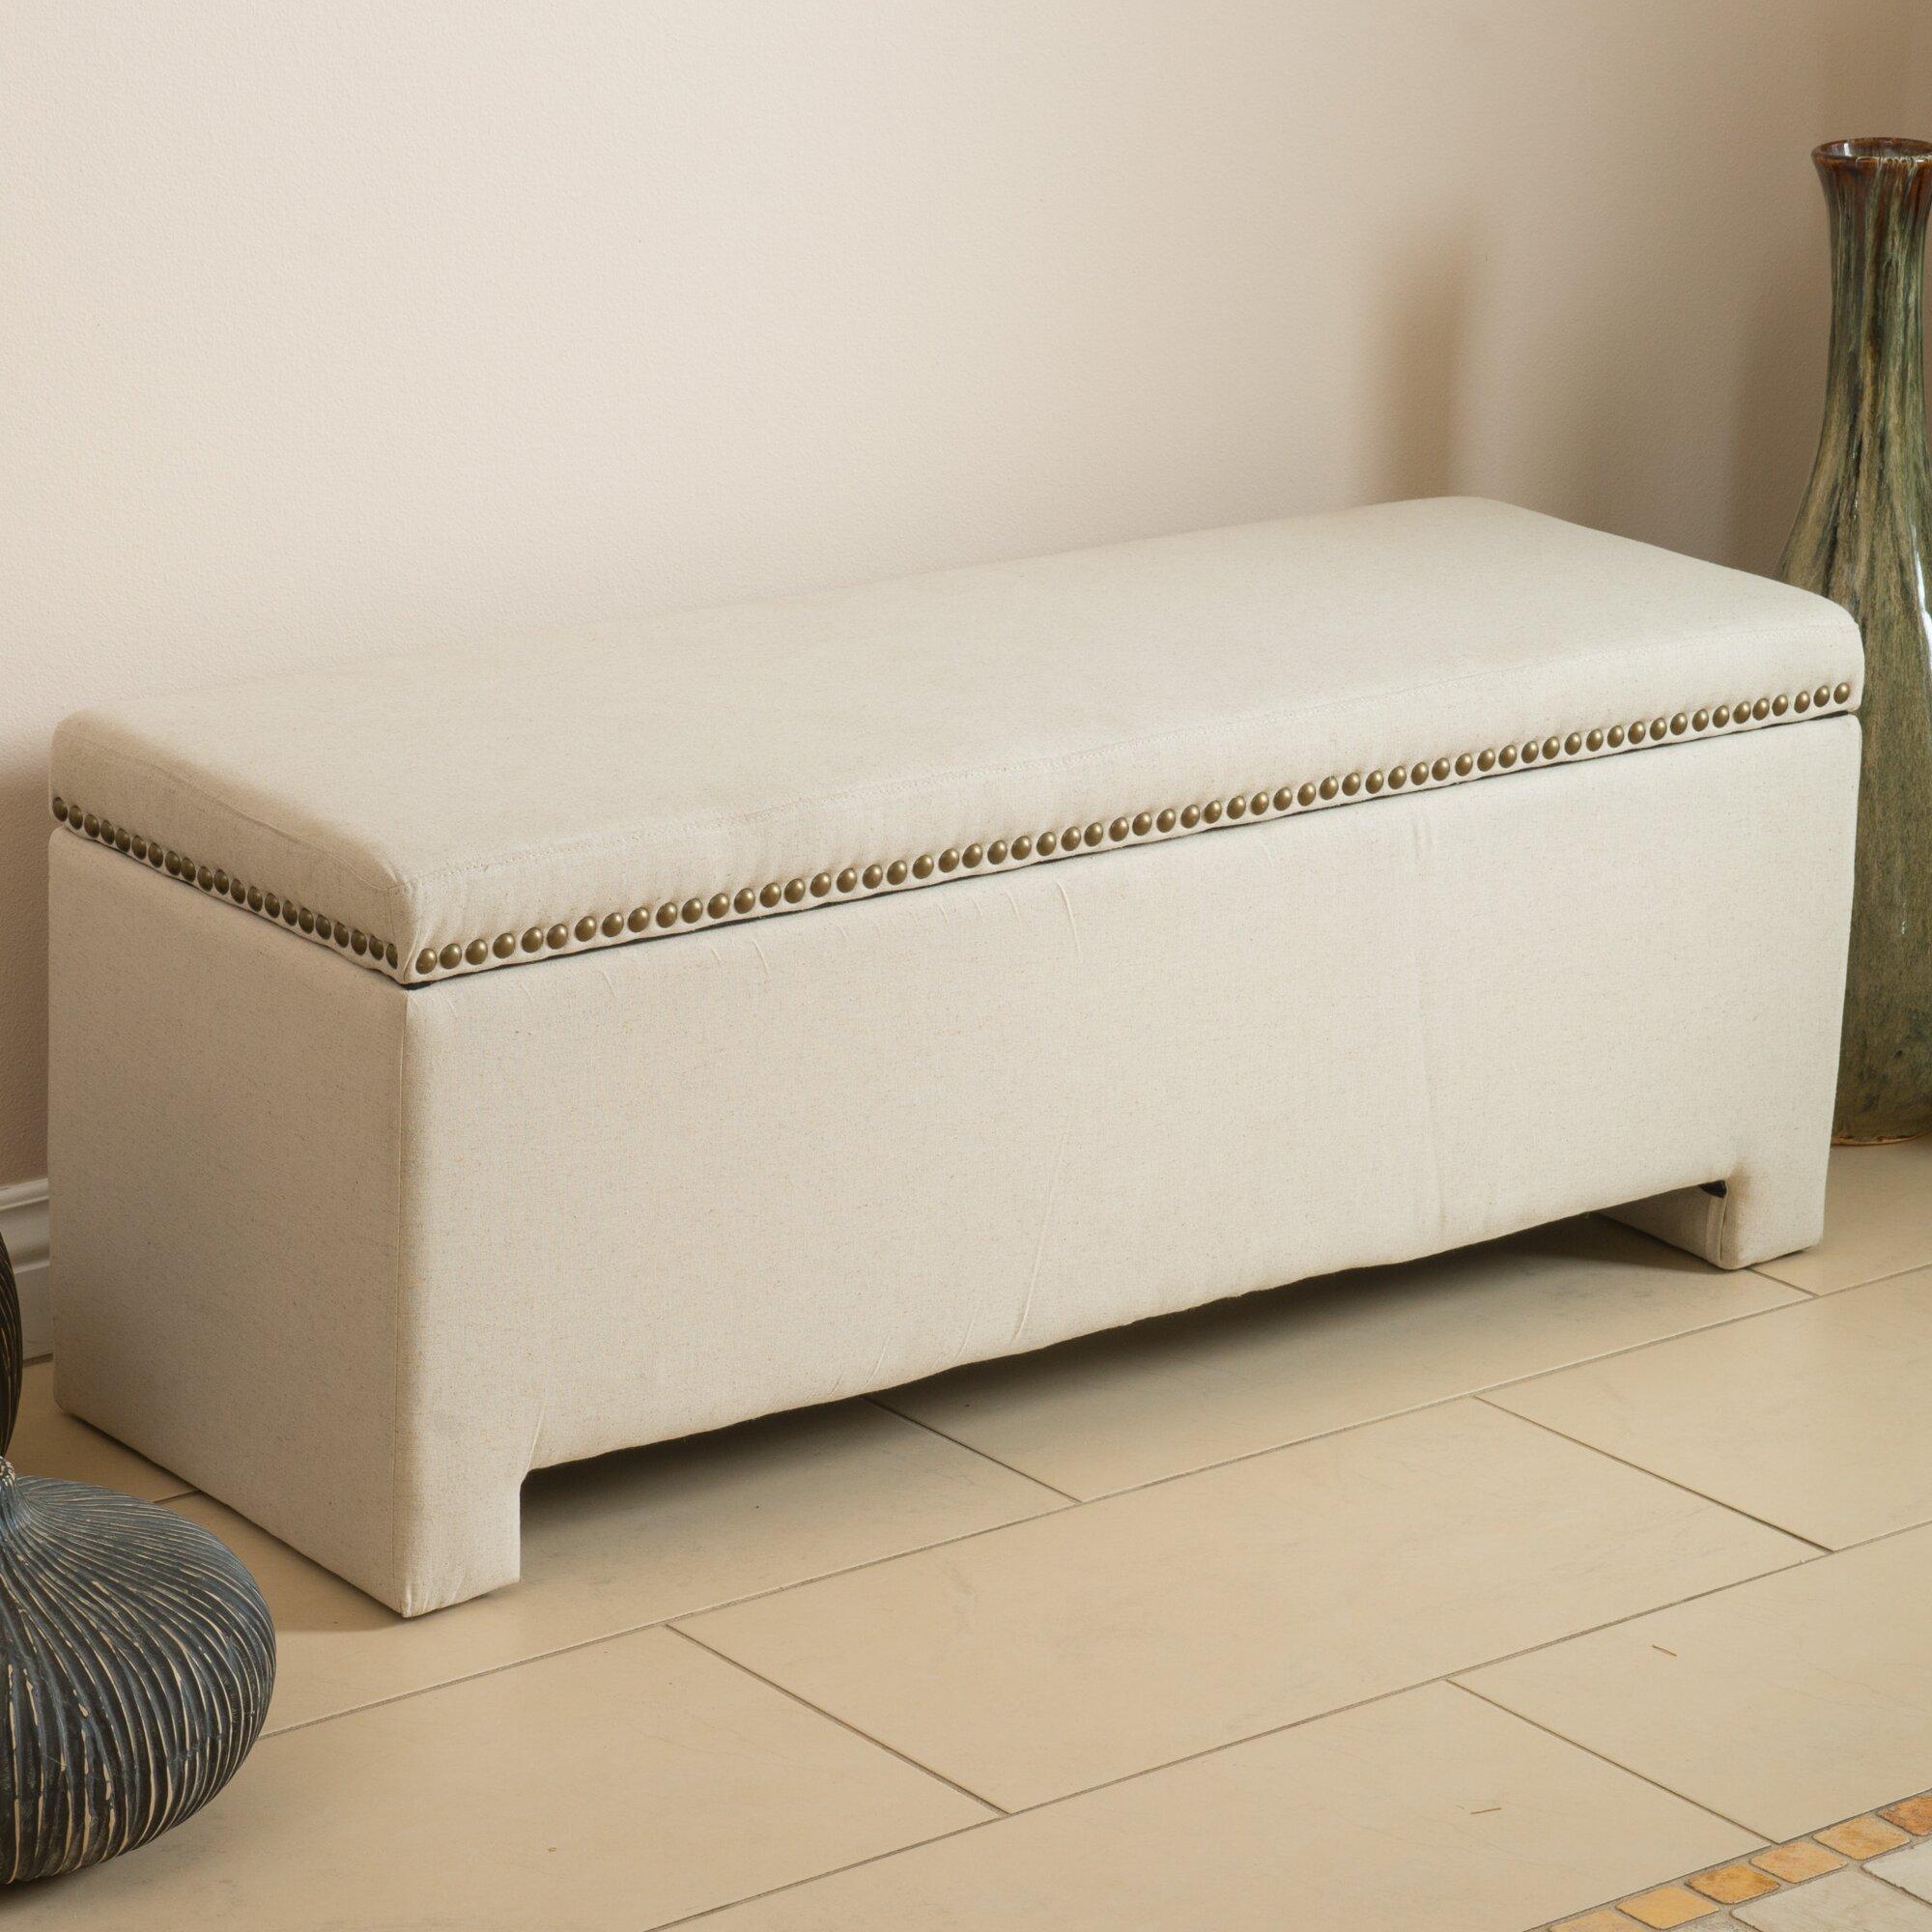 Alcott Hill Cloville Upholstered Storage Bedroom Bench Reviews